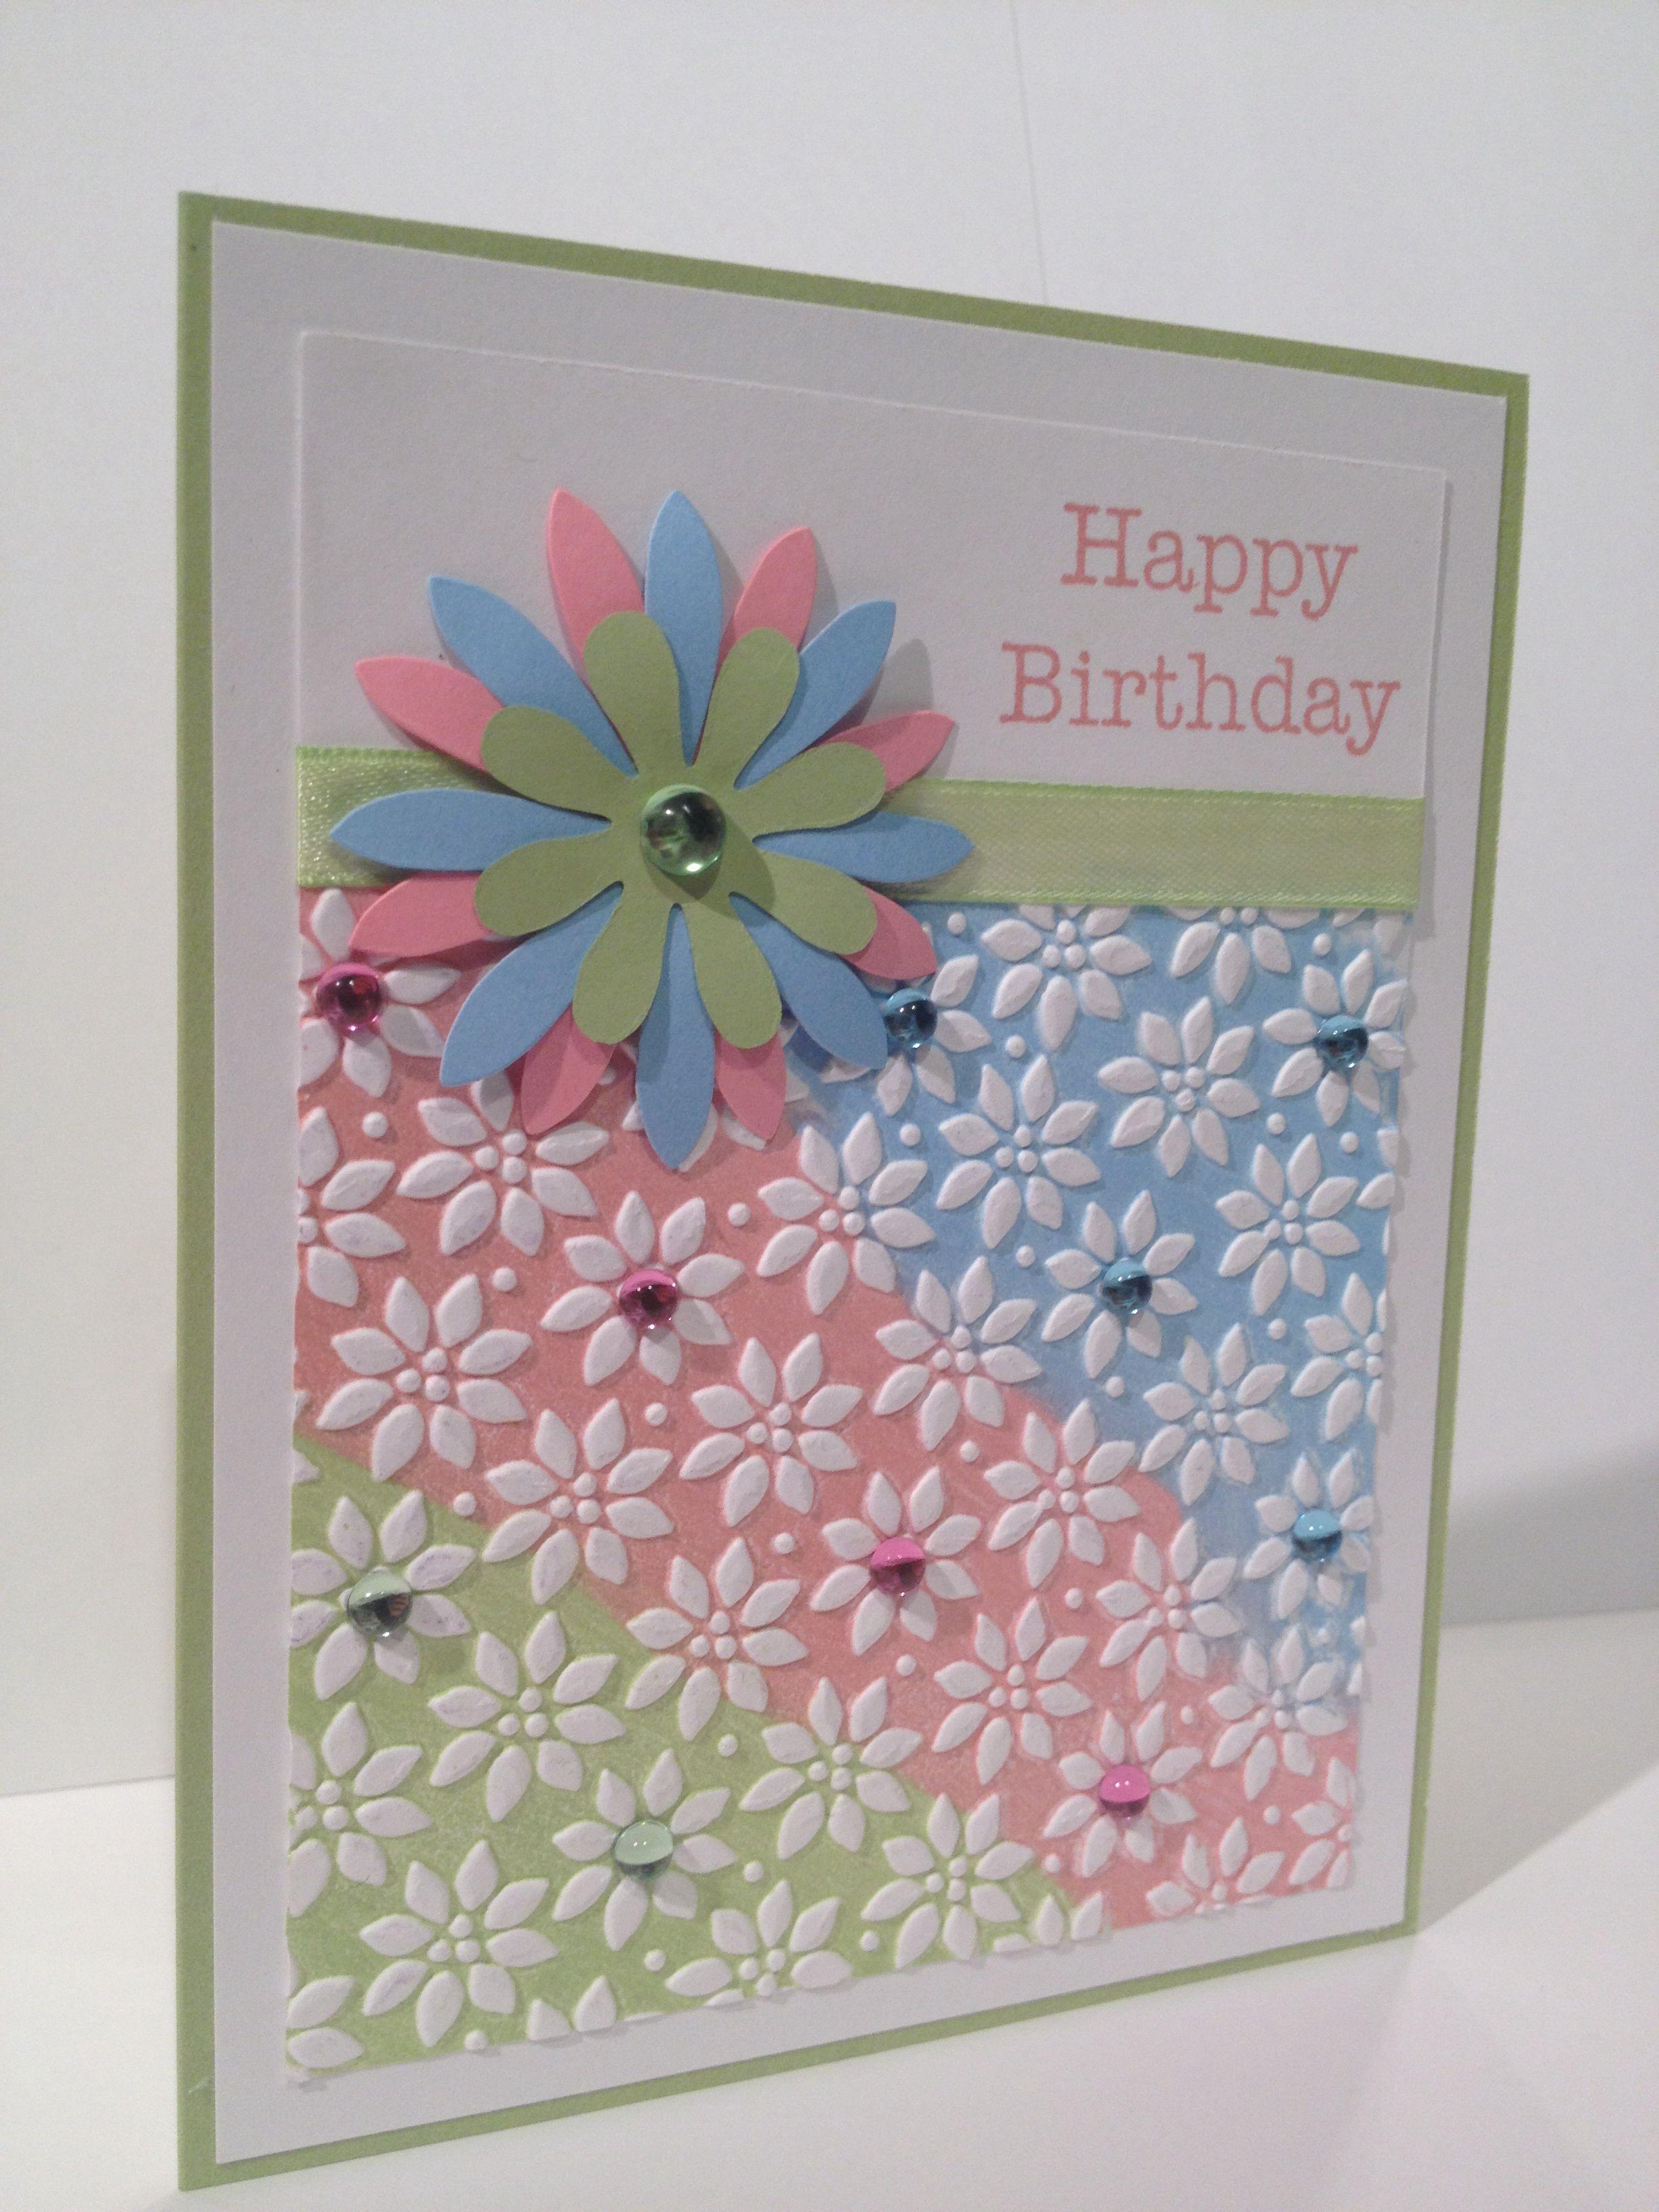 Stampin' up Birthday Card Stampinup inspiration Pinterest